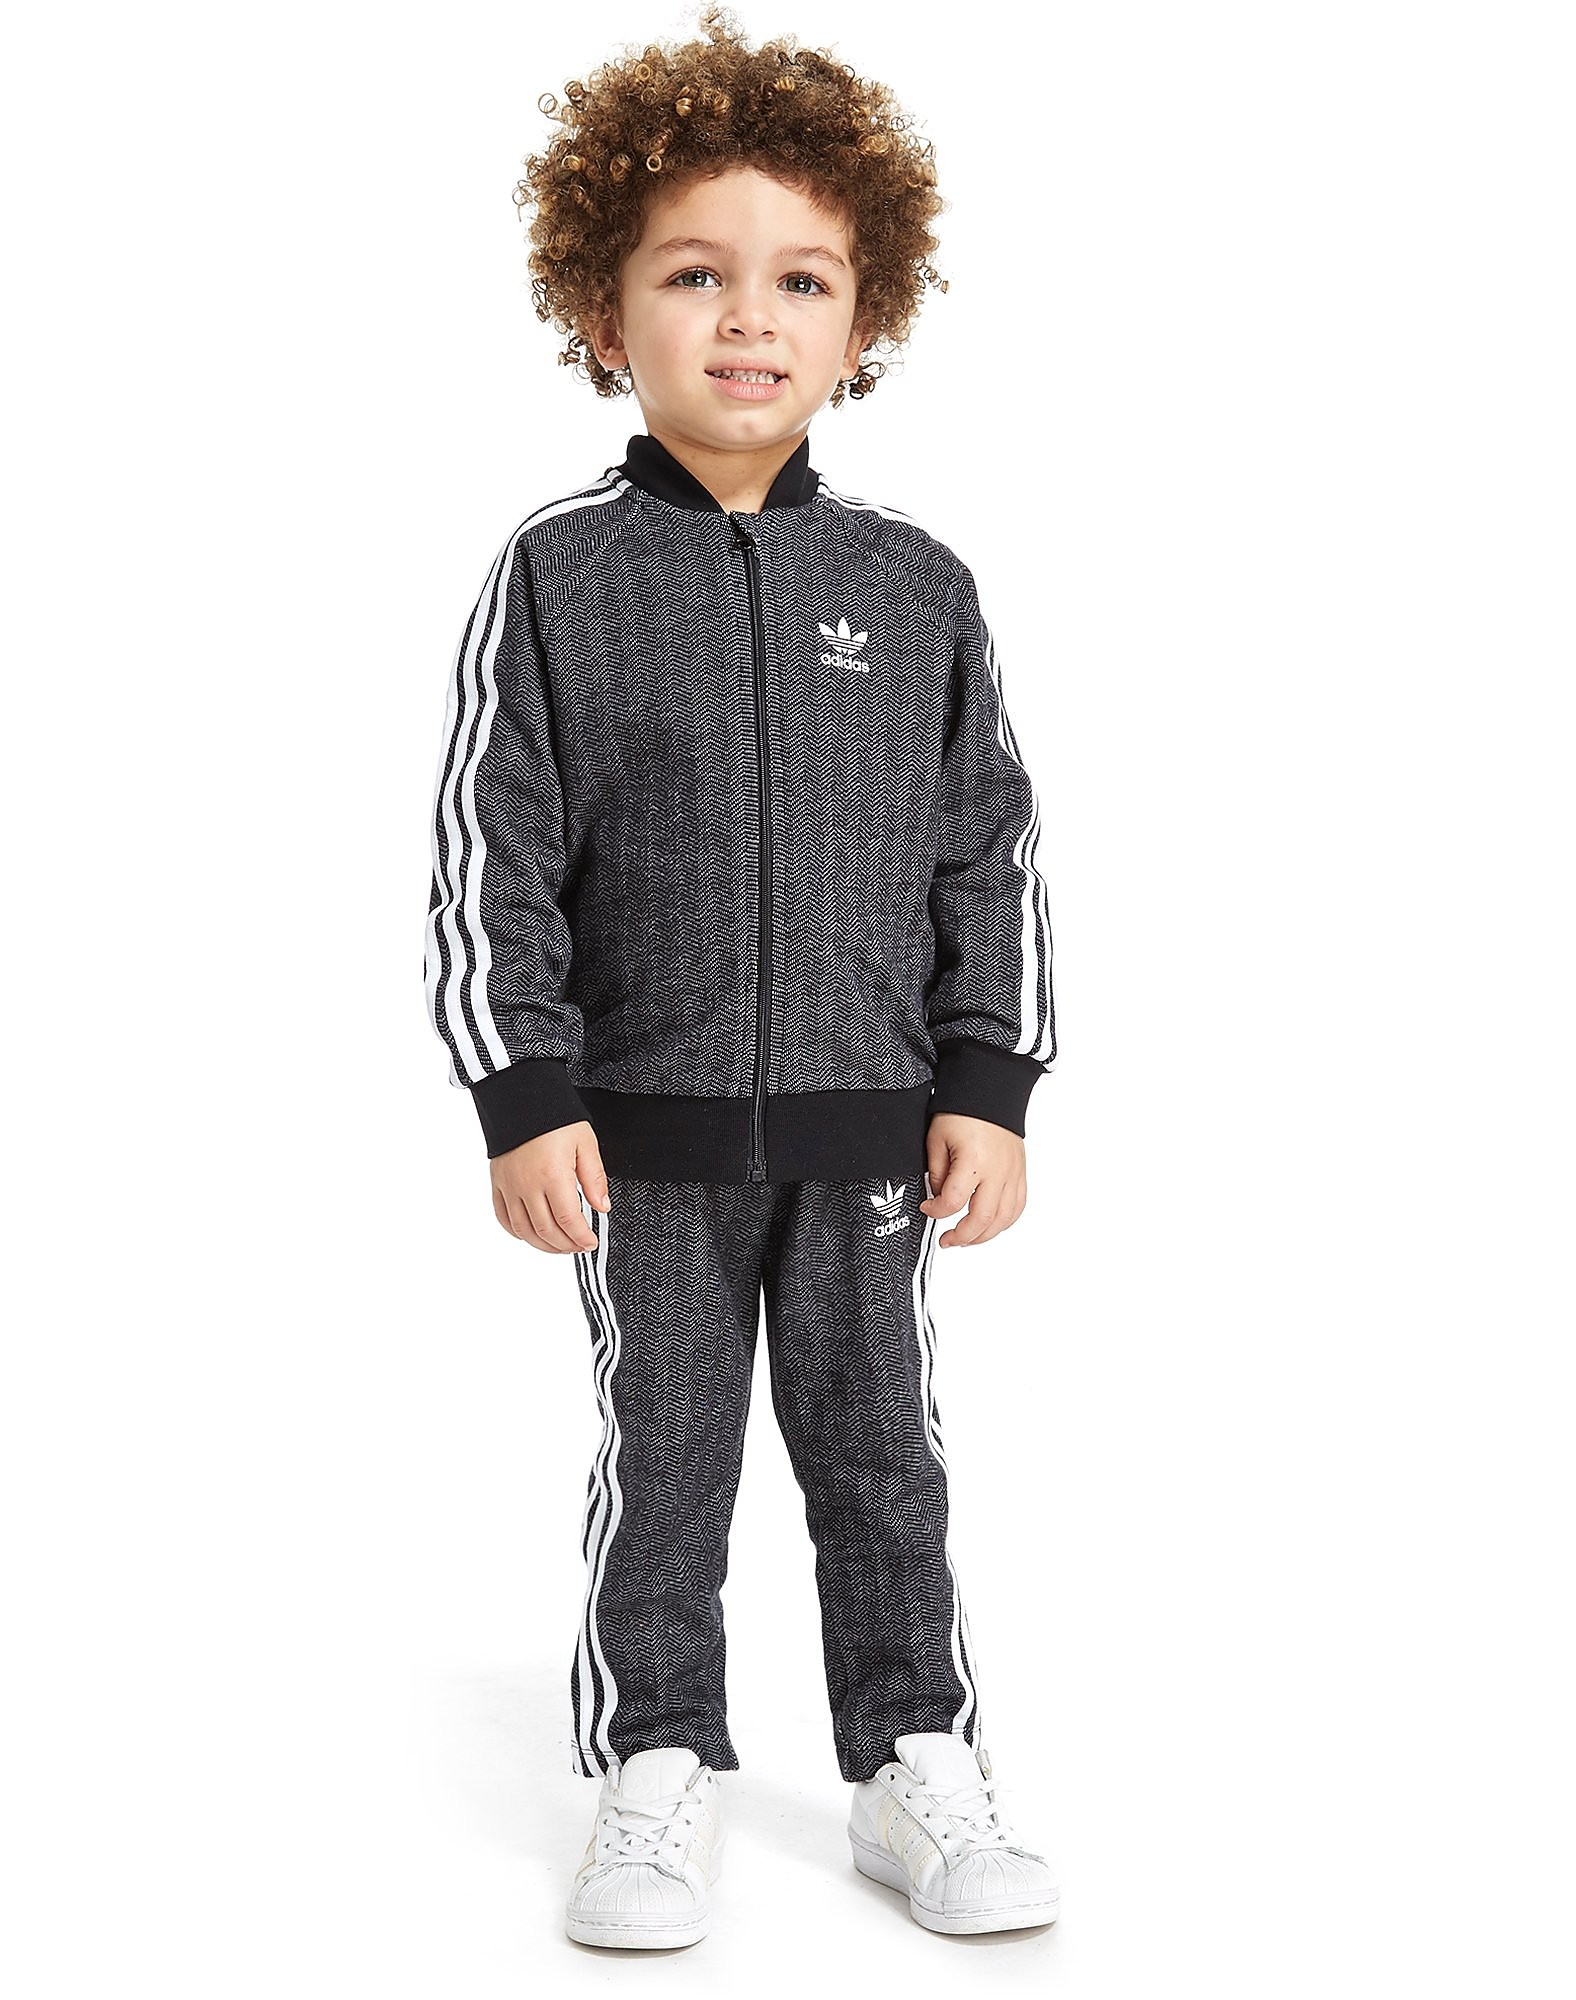 adidas Originals Superstar Tracksuit Infant